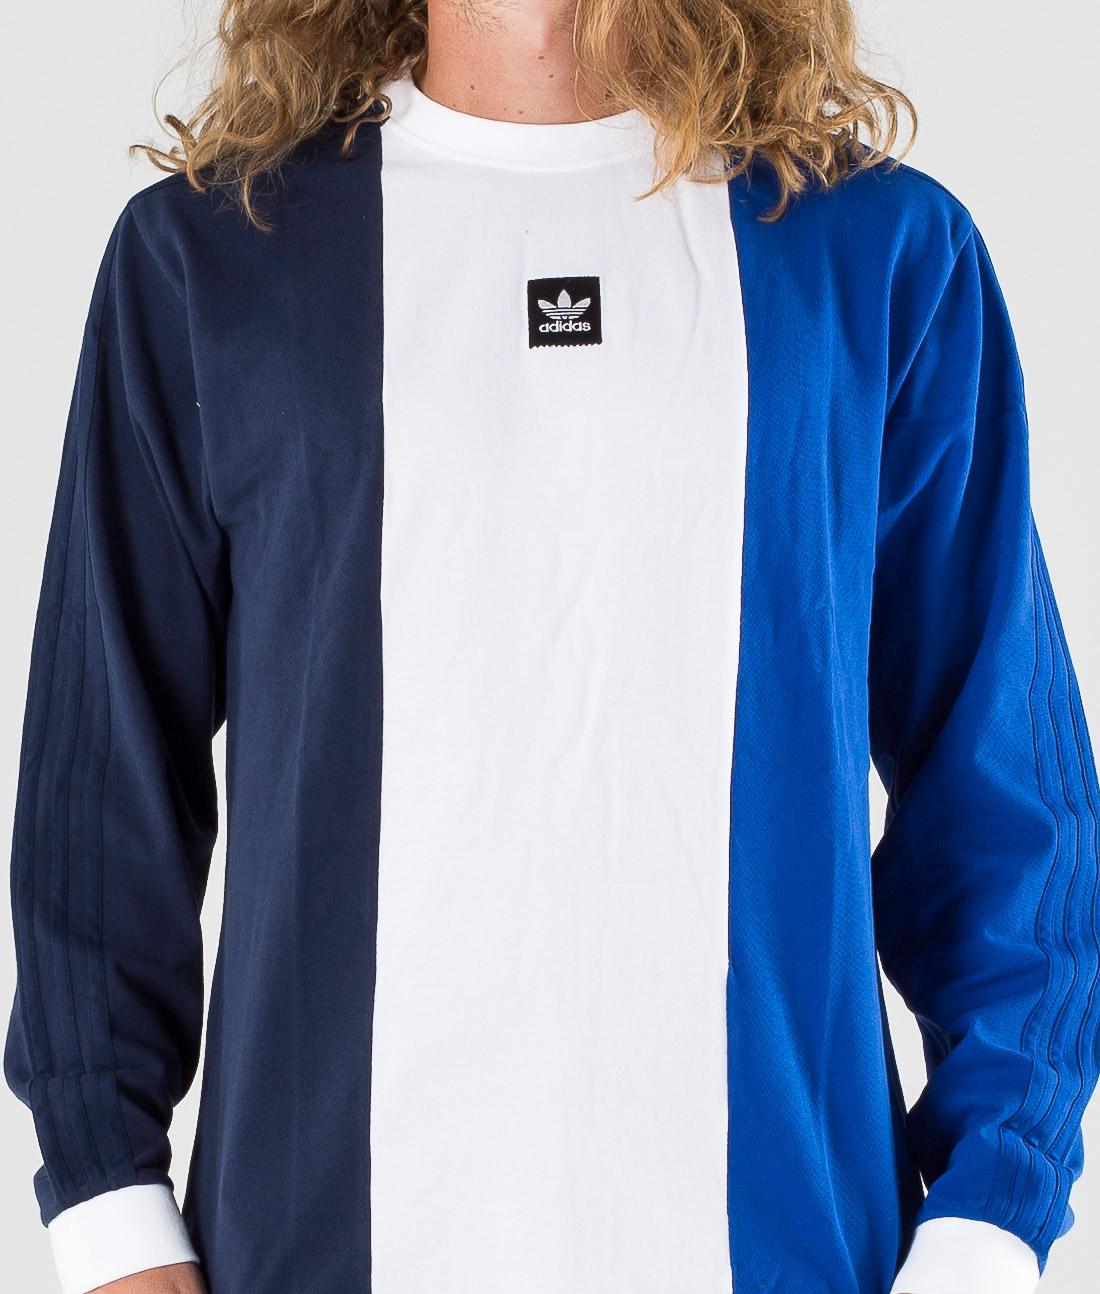 Adidas Skateboarding Tripart Tee T shirt Collegiate NavyWhiteCollegiate Royal